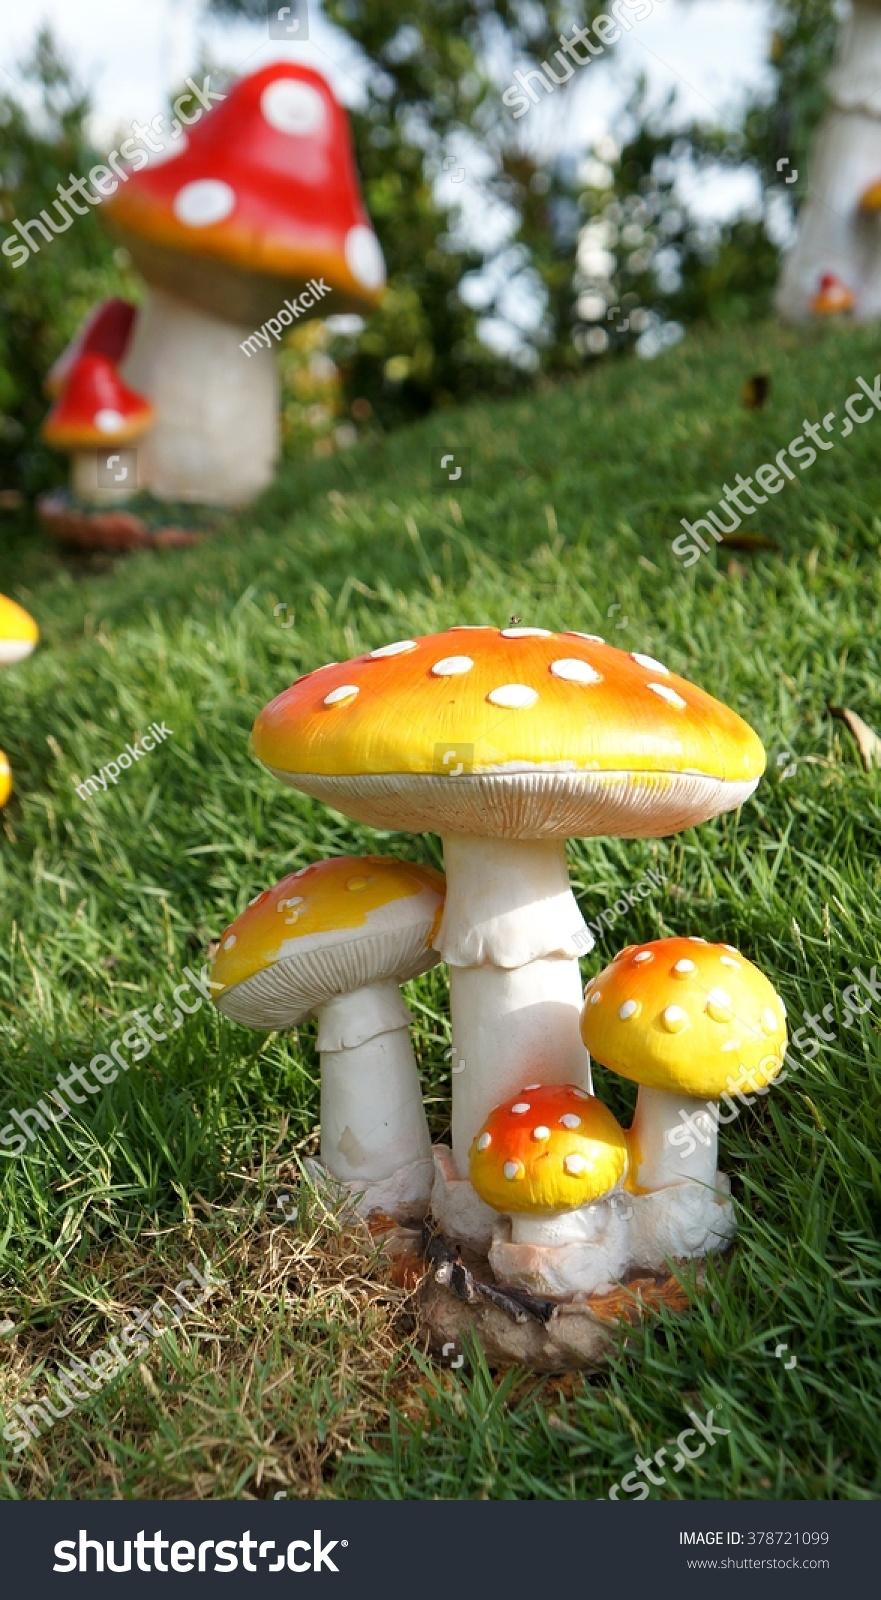 Stone Mushrooms Garden Decoration Stock Photo 378721099 - Shutterstock